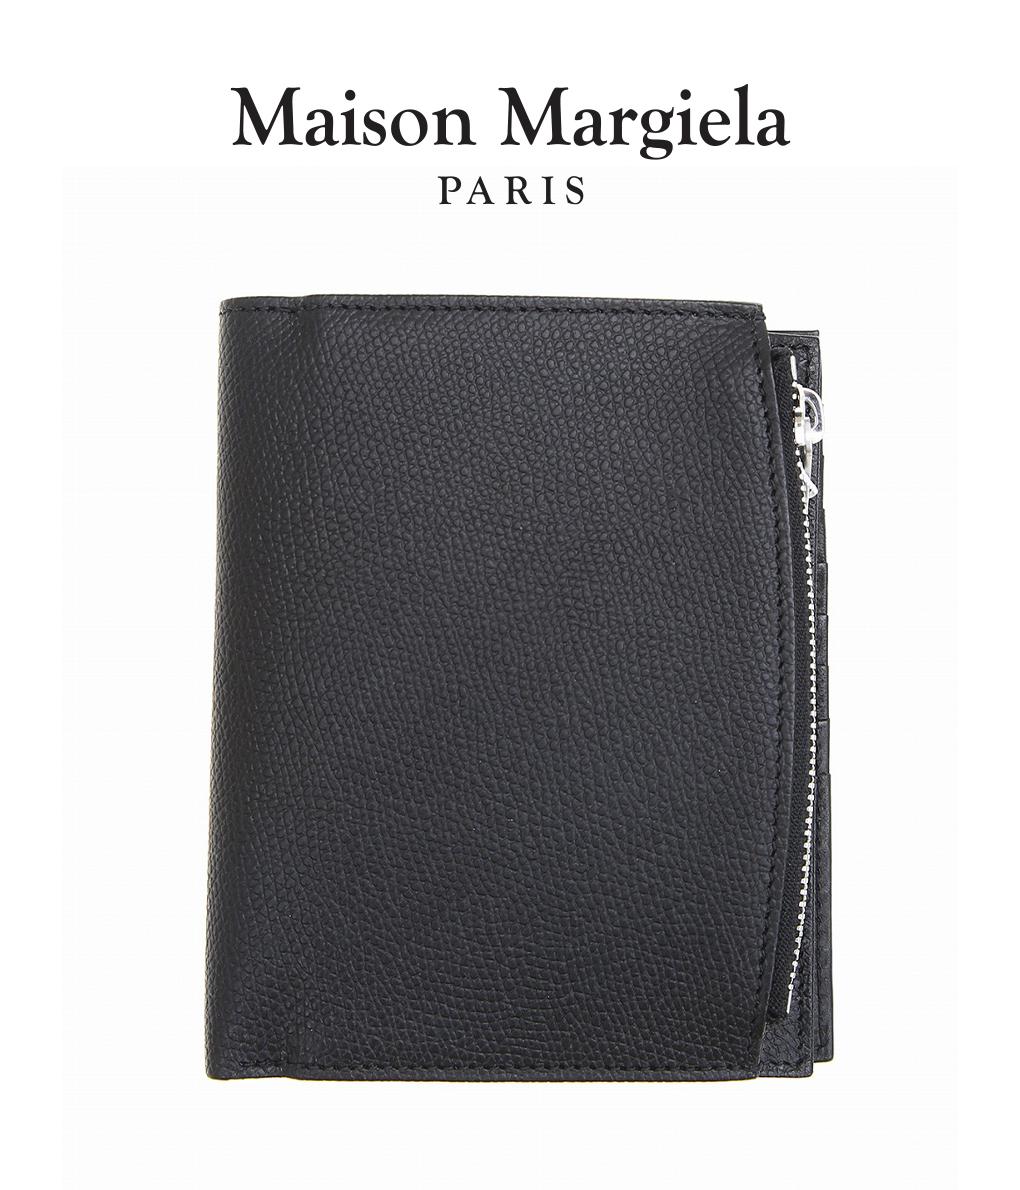 Maison Margiela / メゾン マルジェラ : LEATHER WALLET : メゾン マルジェラ レザー ウォレット 財布 : S35UI0437-P0399 【RIP】【BJB】